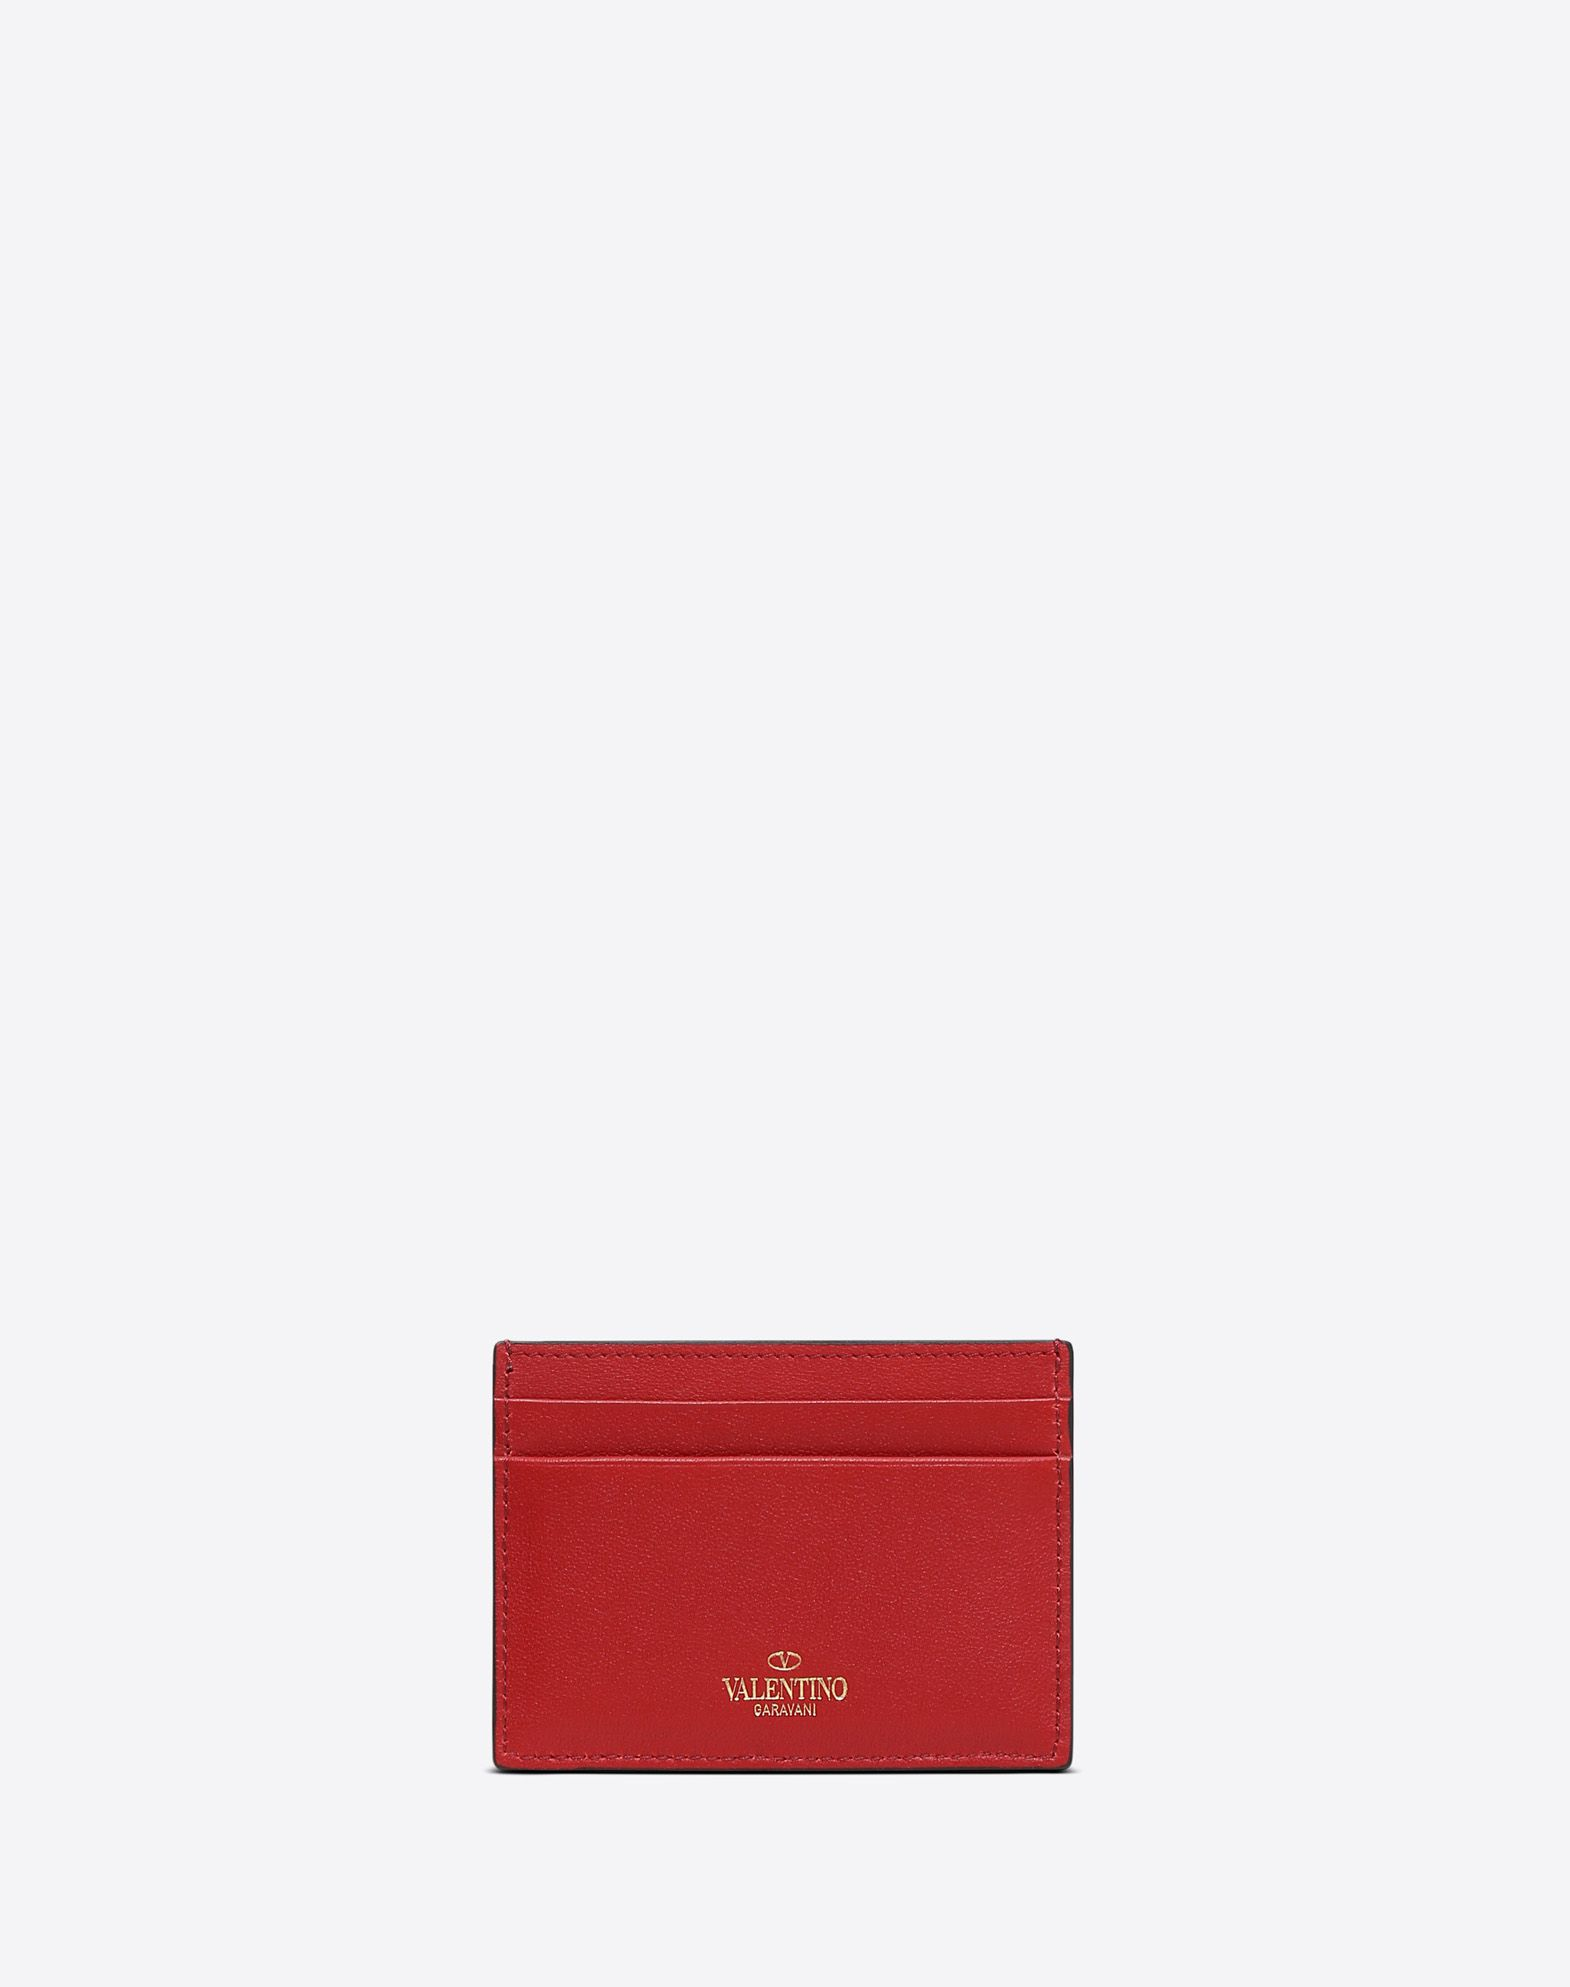 VALENTINO GARAVANI Rockstud Cardholder COIN PURSES & CARD CASES D d